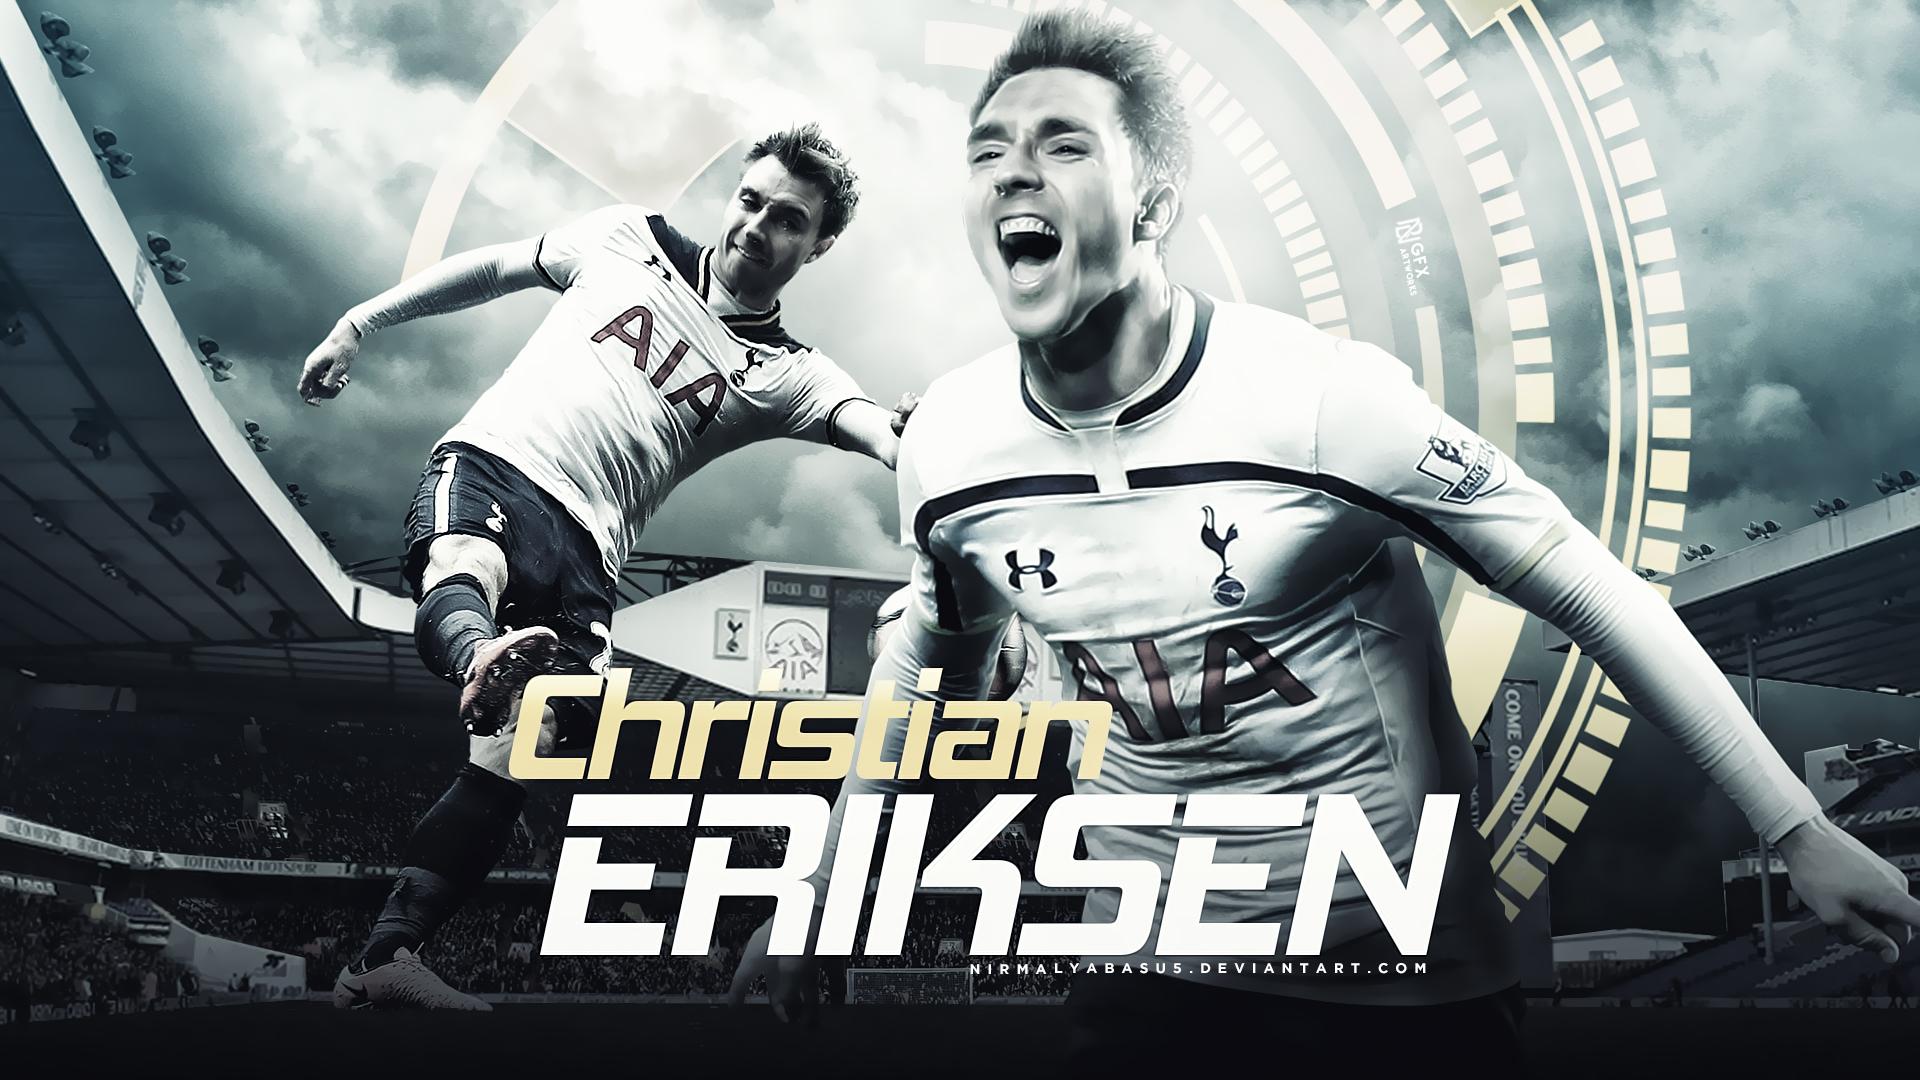 Christian Eriksen By Nirmalyabasu5 On DeviantArt